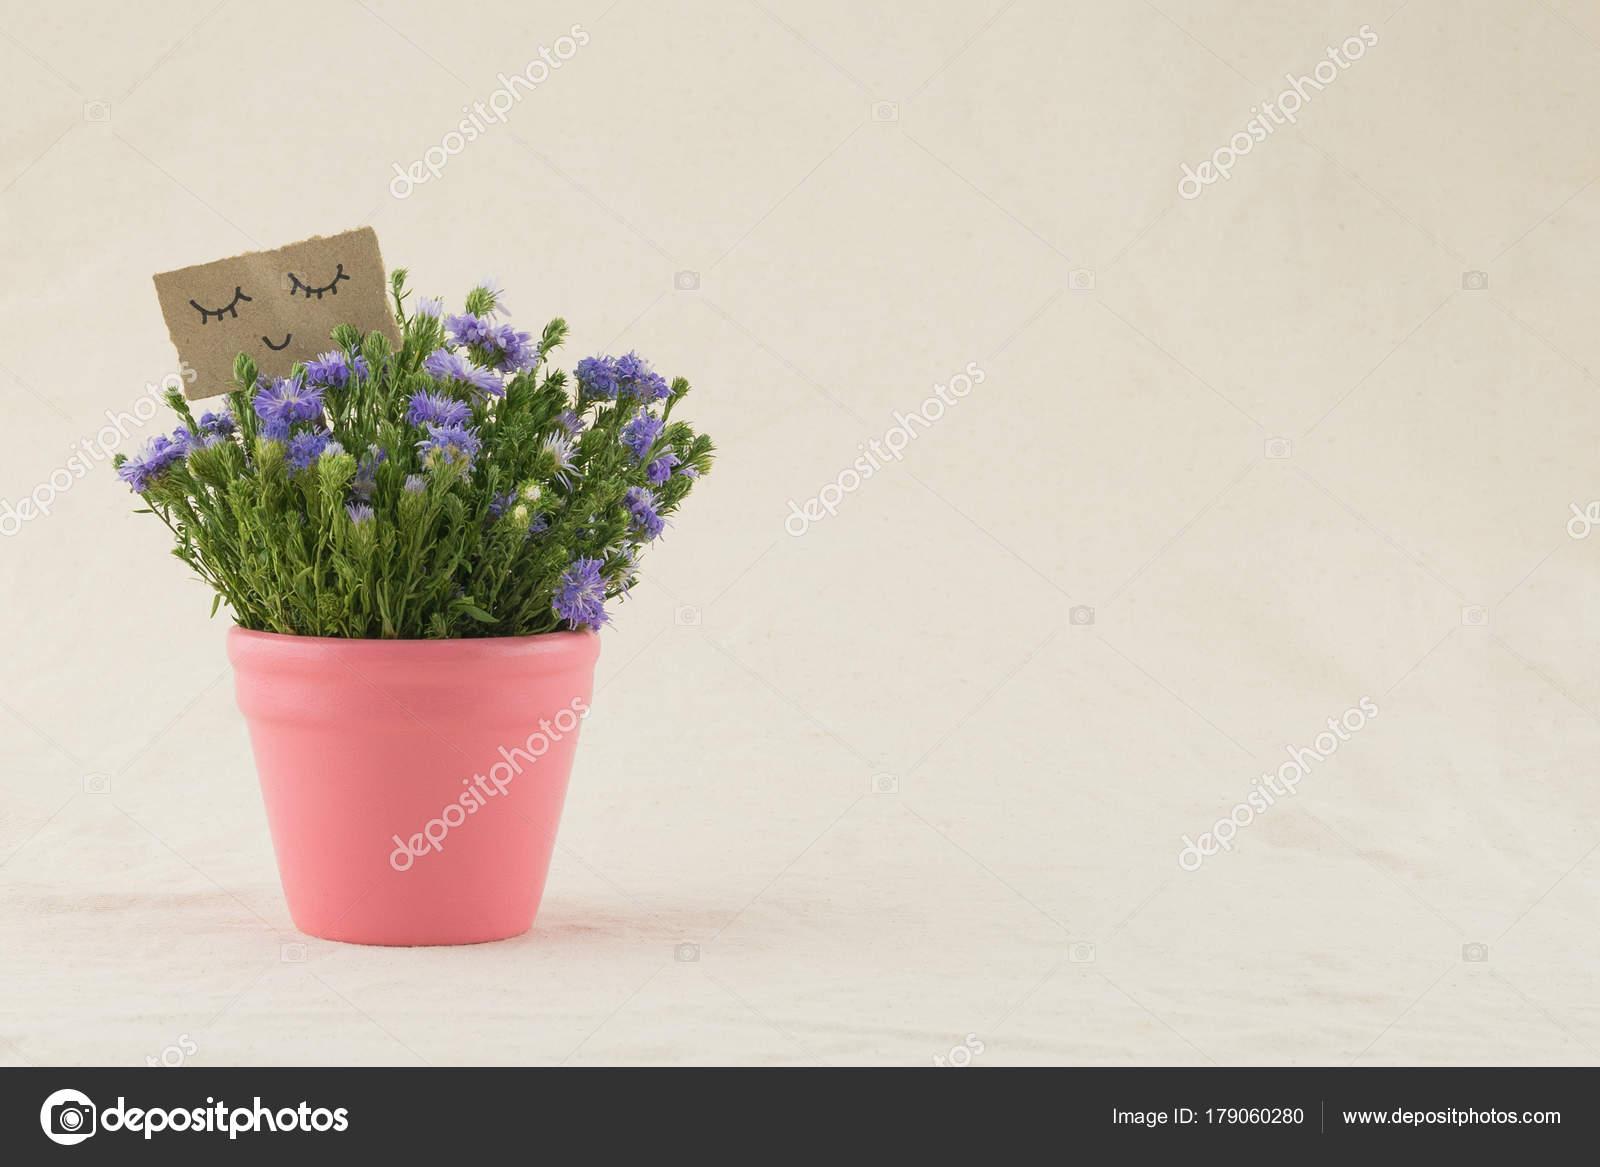 Purple cutter flowers bouquet pink pot smiling face card copy purple cutter flowers bouquet pink pot smiling face card copy stock photo izmirmasajfo